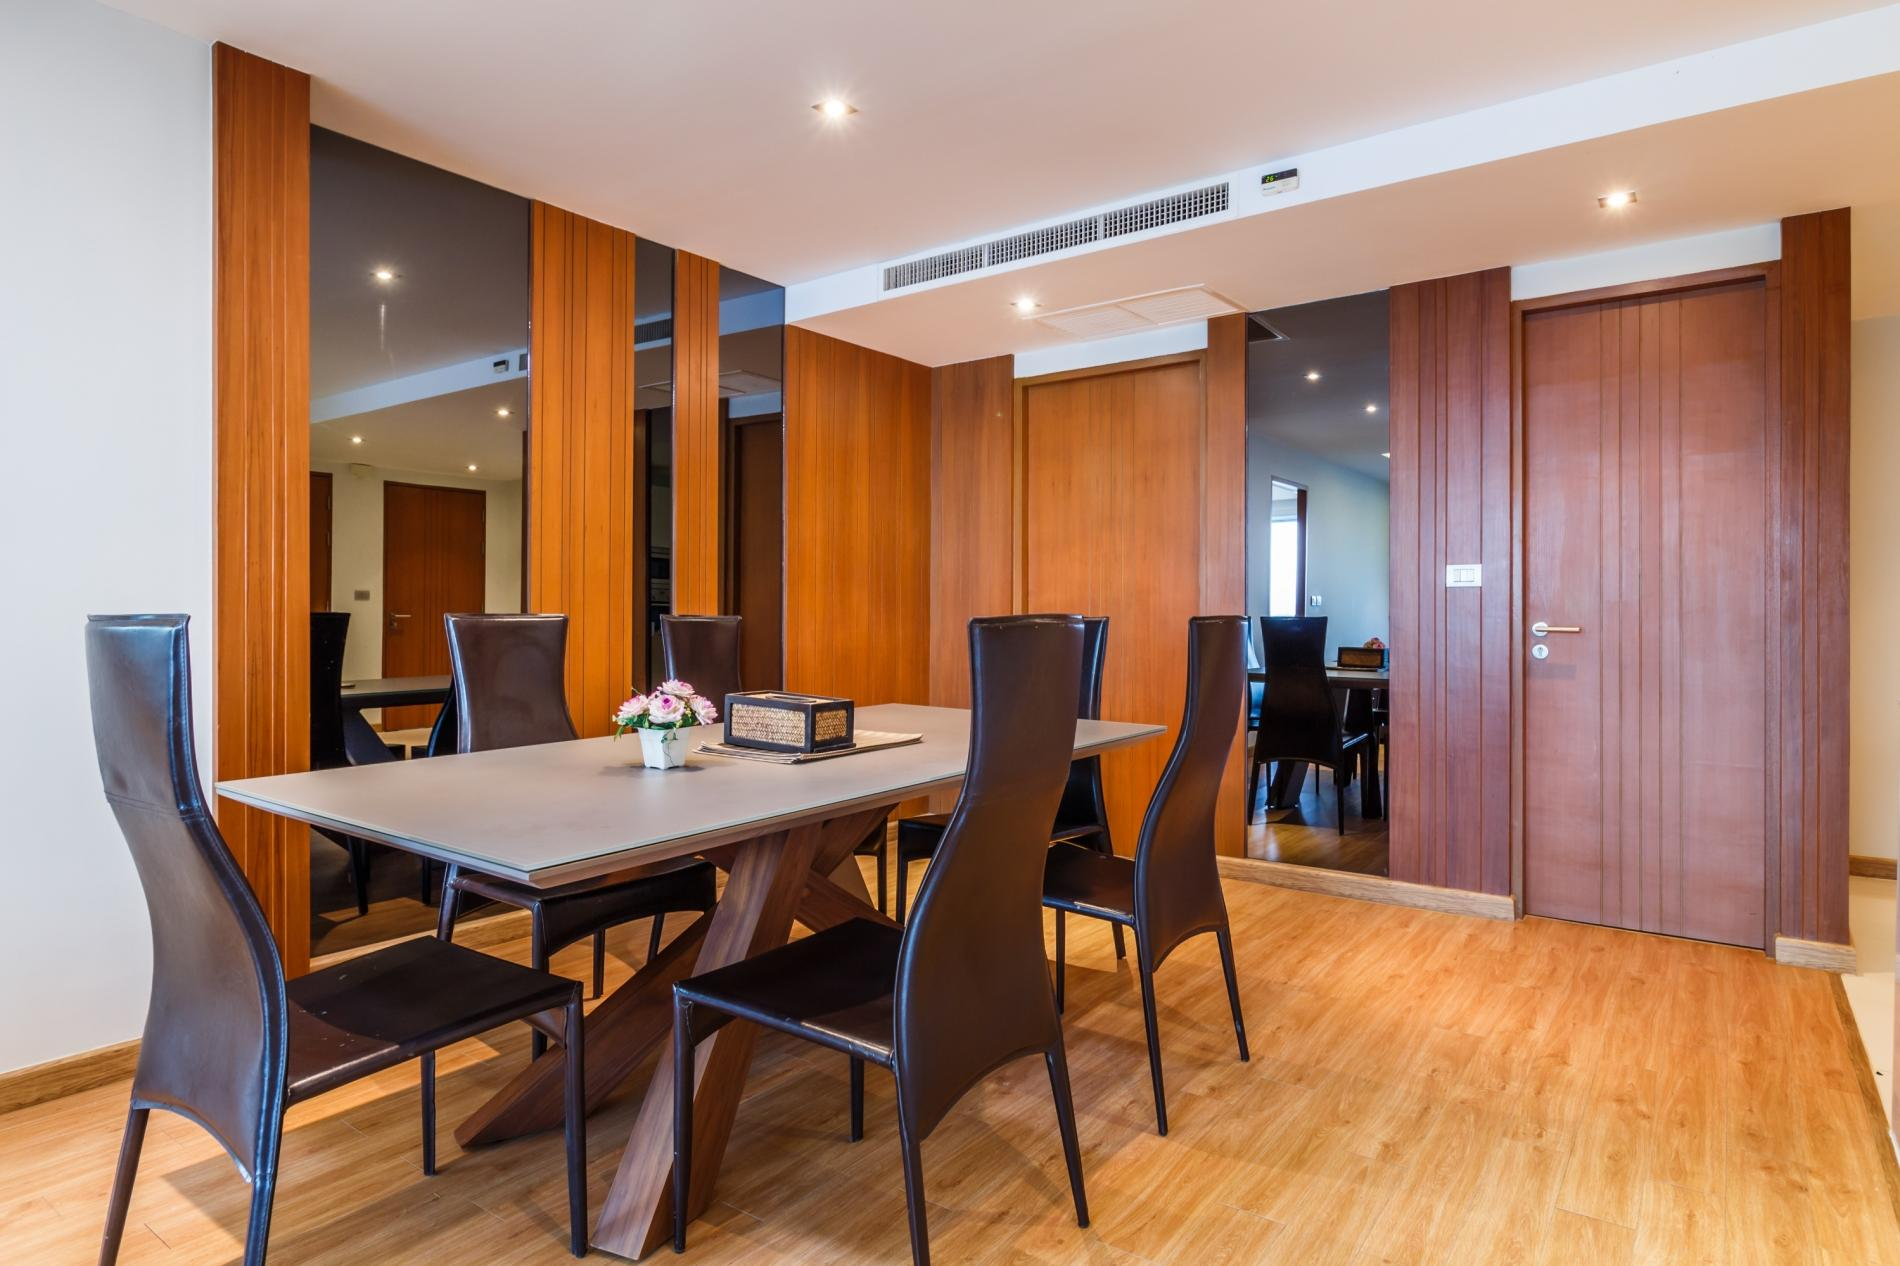 Apartment Privilege12 - Seaview 3 bedroom luxury apartment on Kalim bay photo 20319613